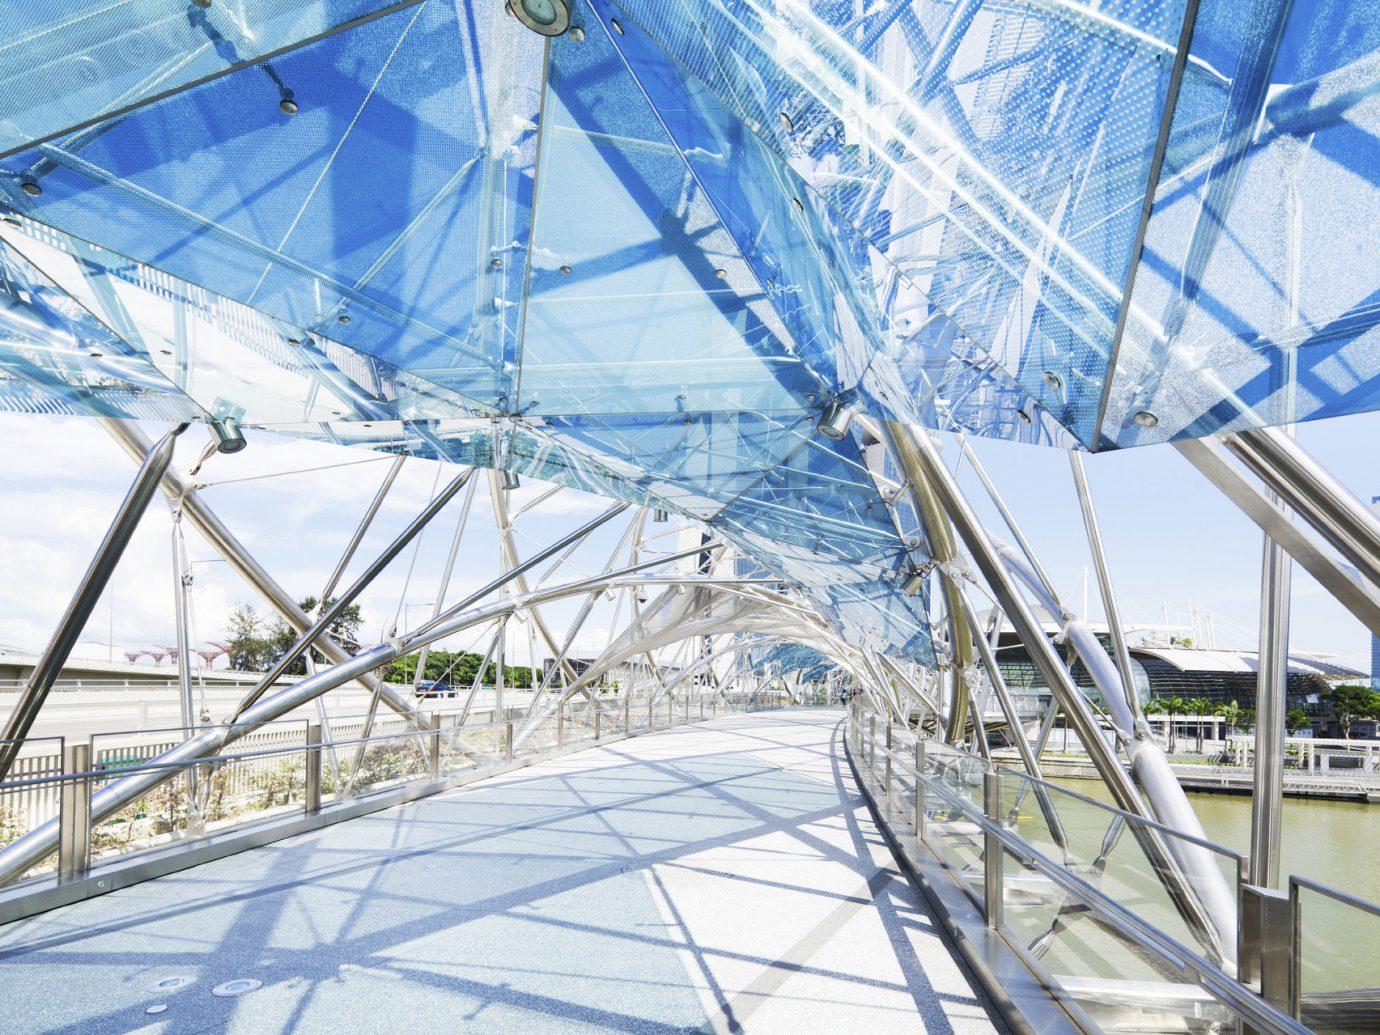 Travel Tips outdoor structure ferris wheel sport venue energy stadium mast tourist attraction arena